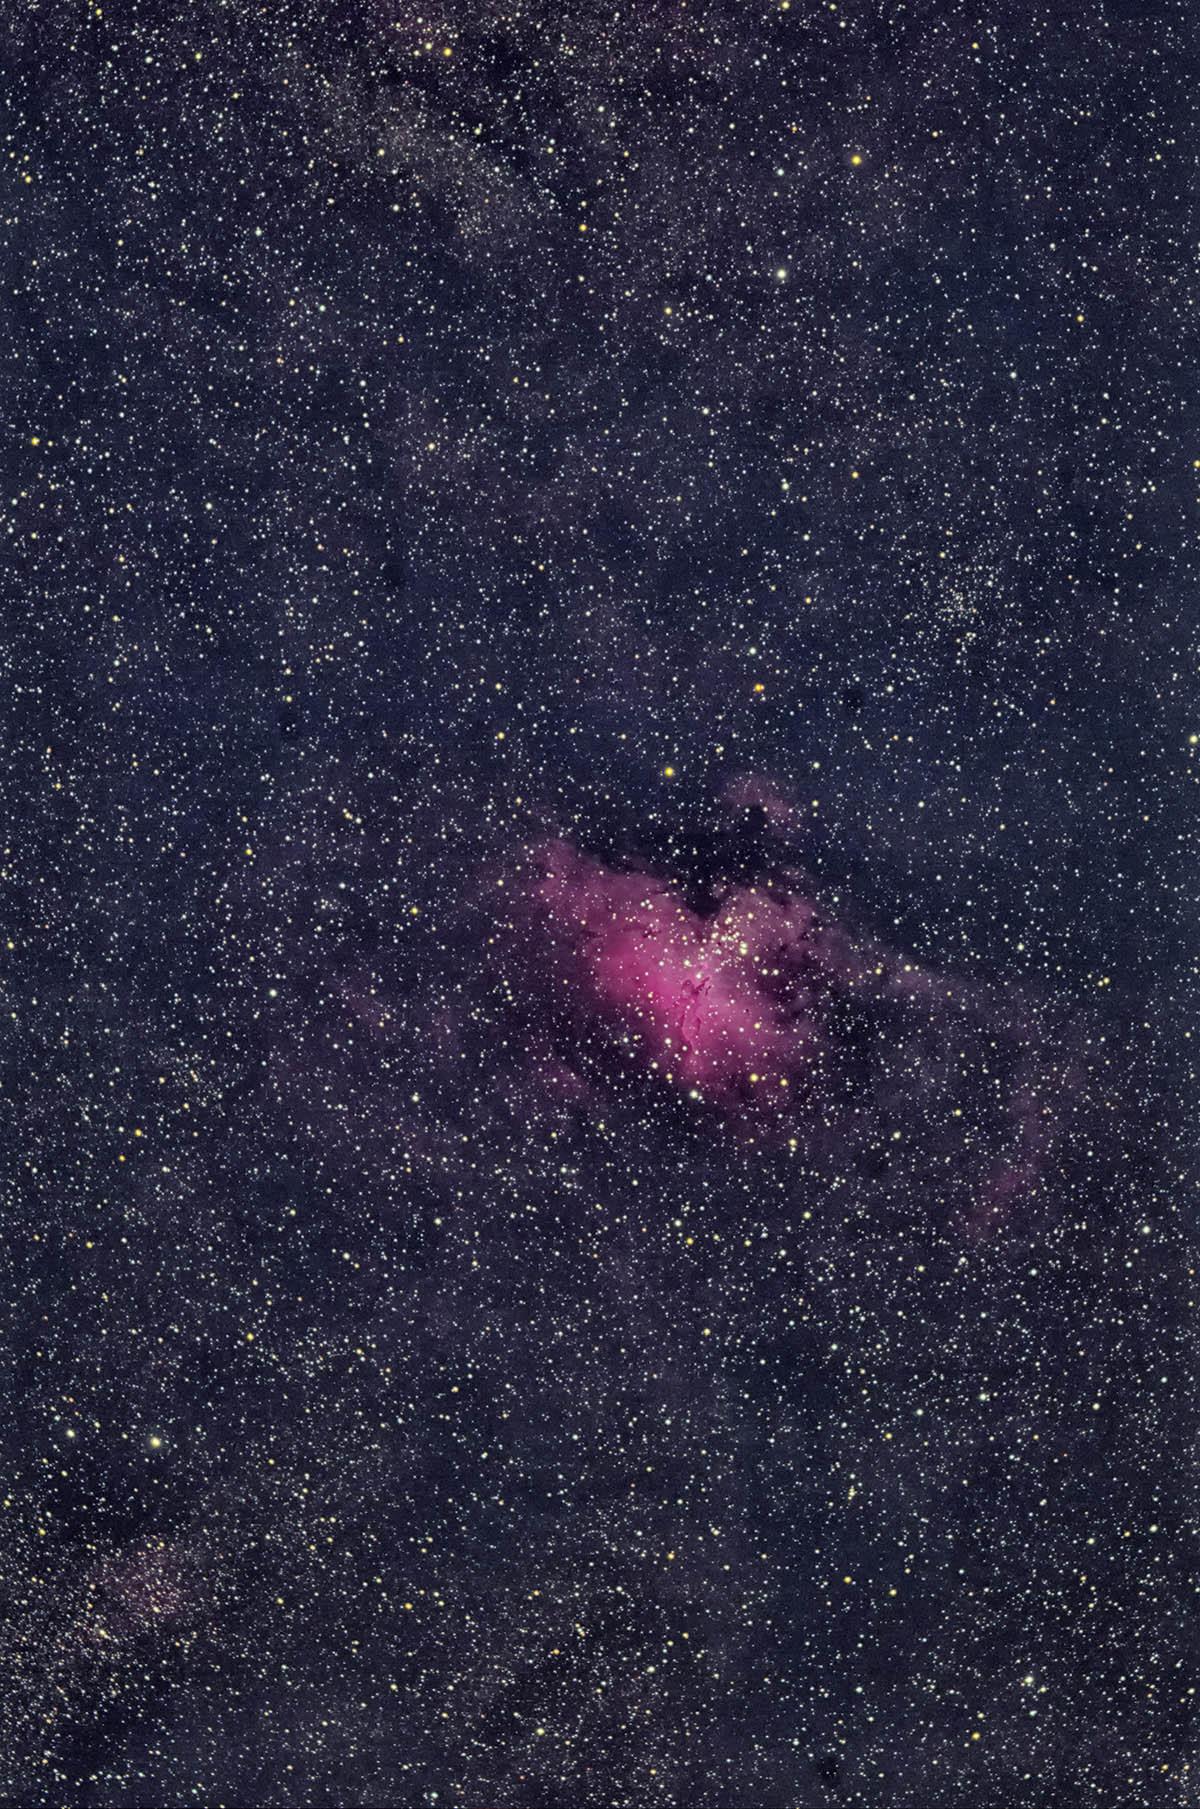 5月14日の星空 星雲編_e0174091_17233210.jpg